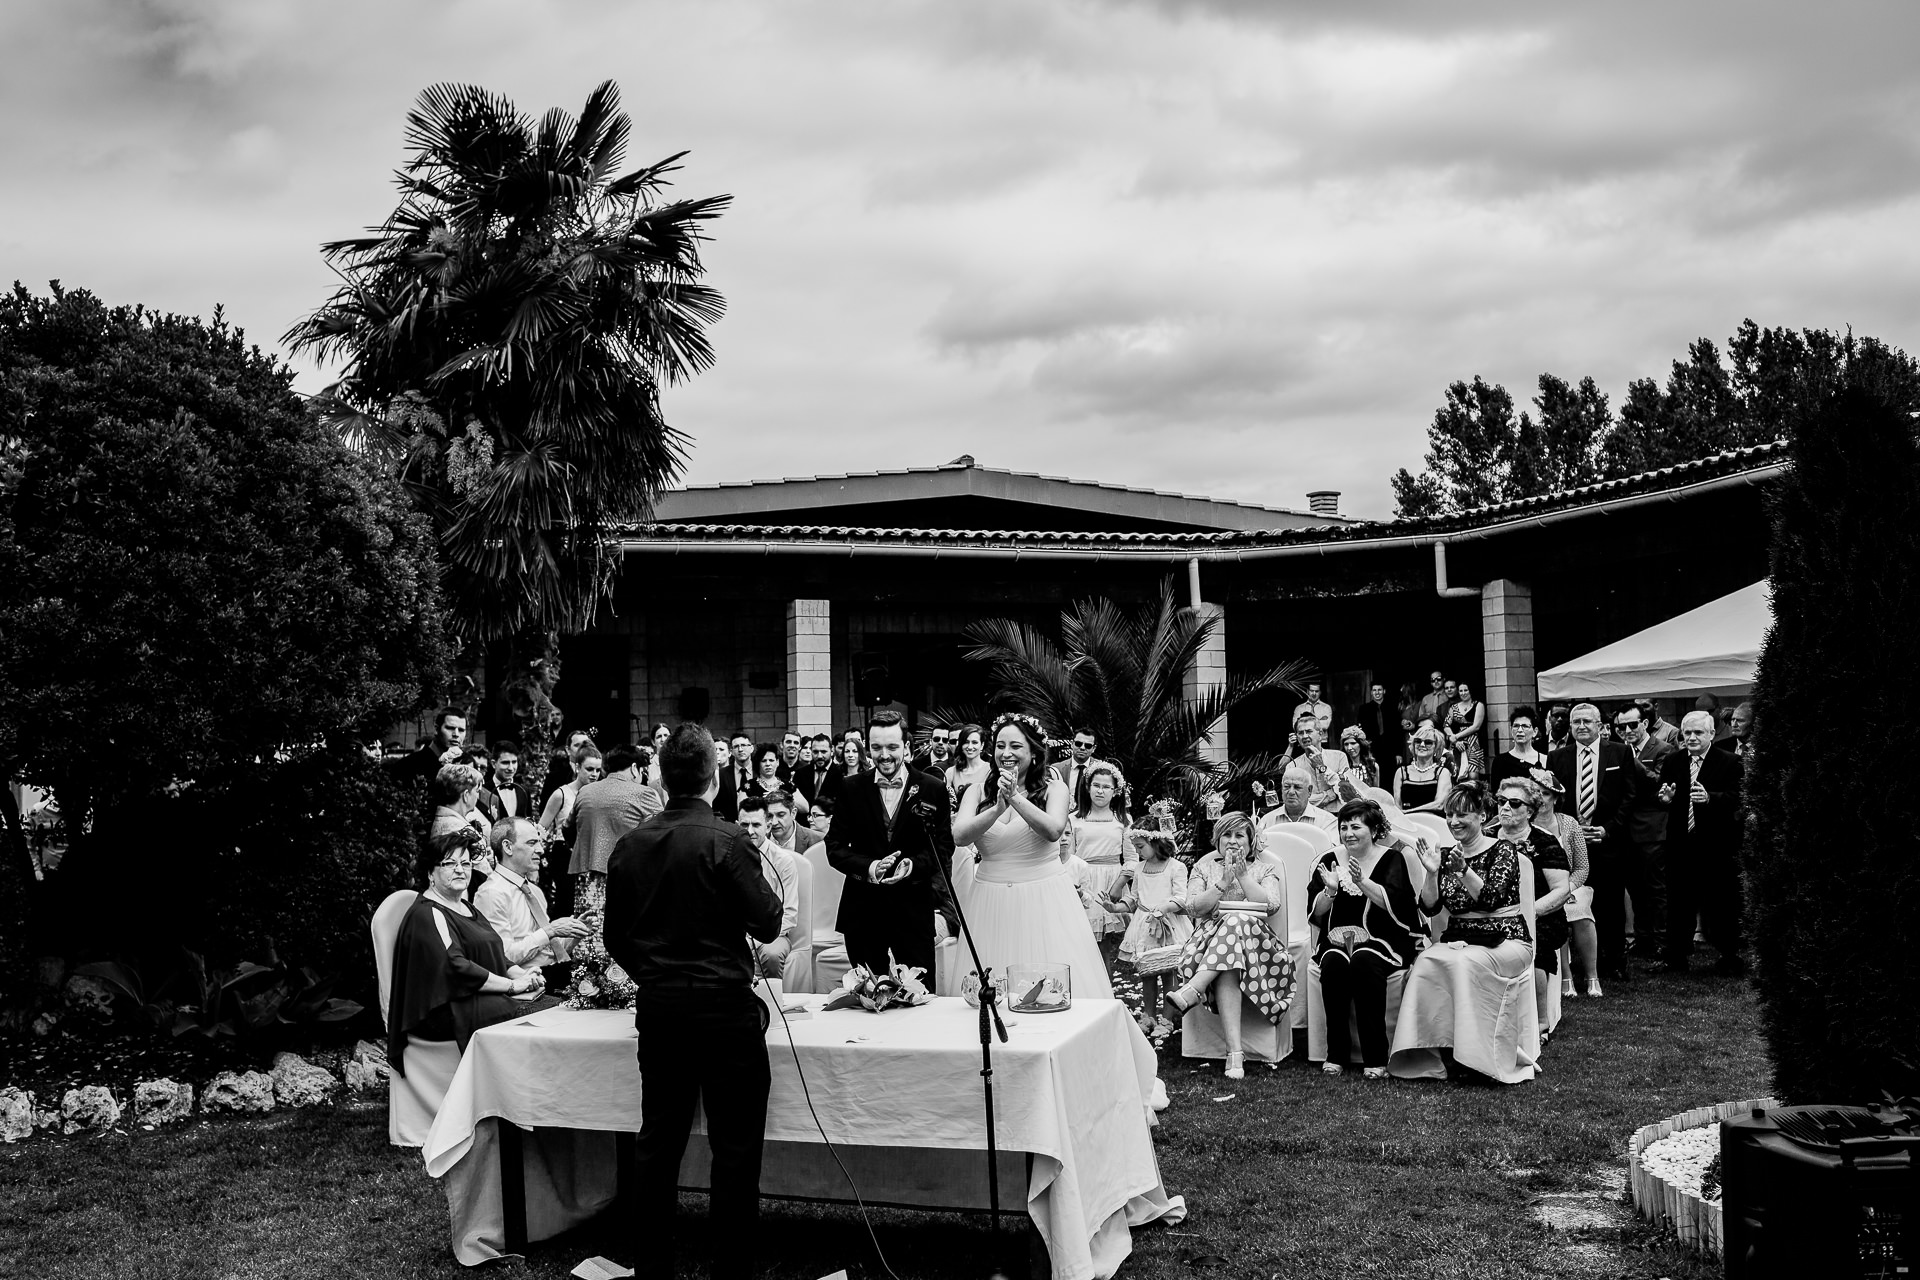 boda civil restaurante lola 130615